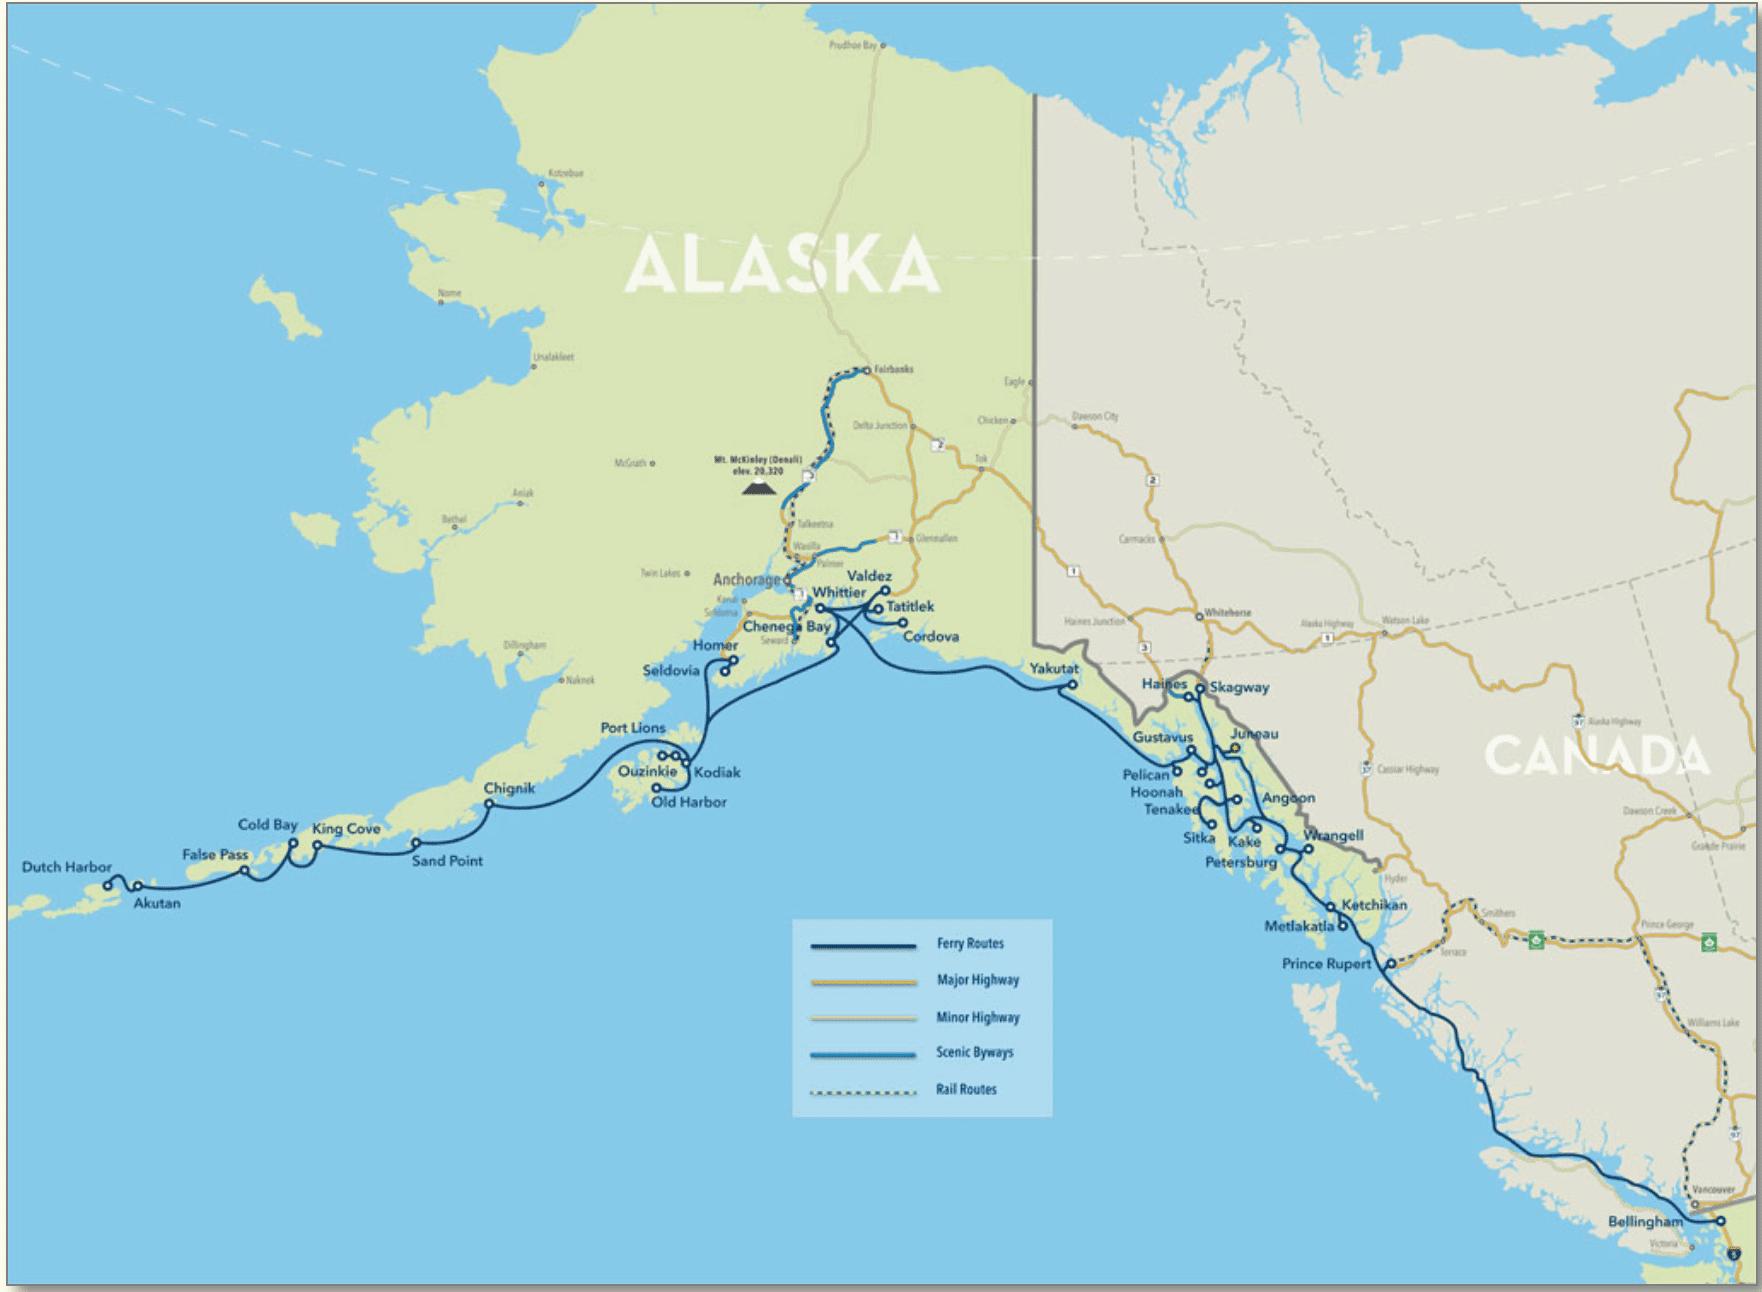 Alaska Marine Highway